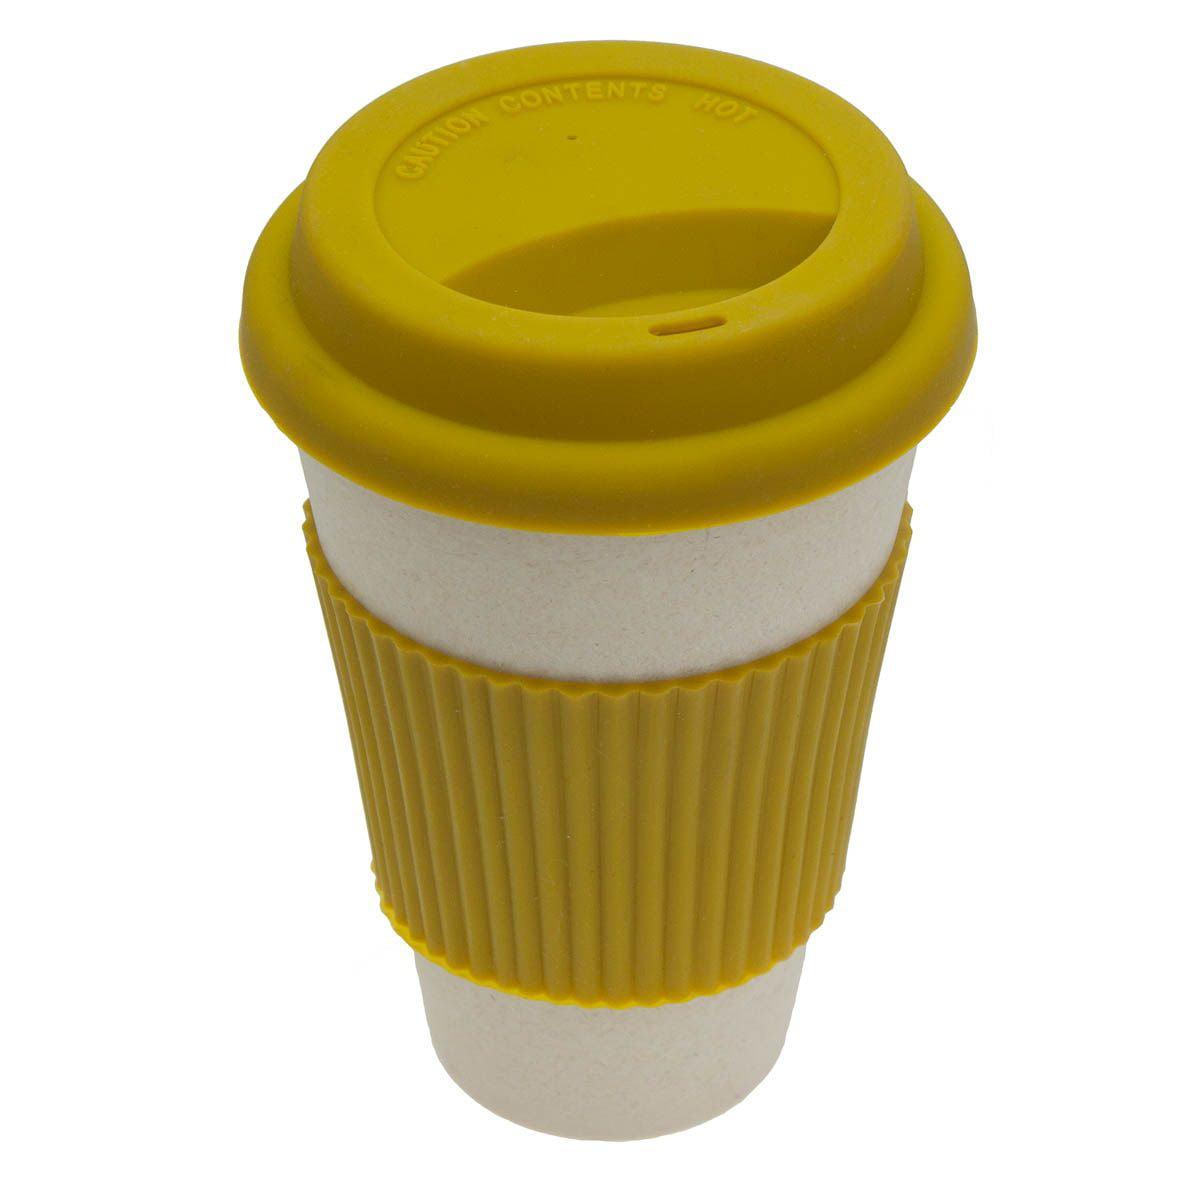 Bamboo Biodegradable Travel Mug Tumbler Eco-friendly ReNewable Reusable 14oz by Texsport